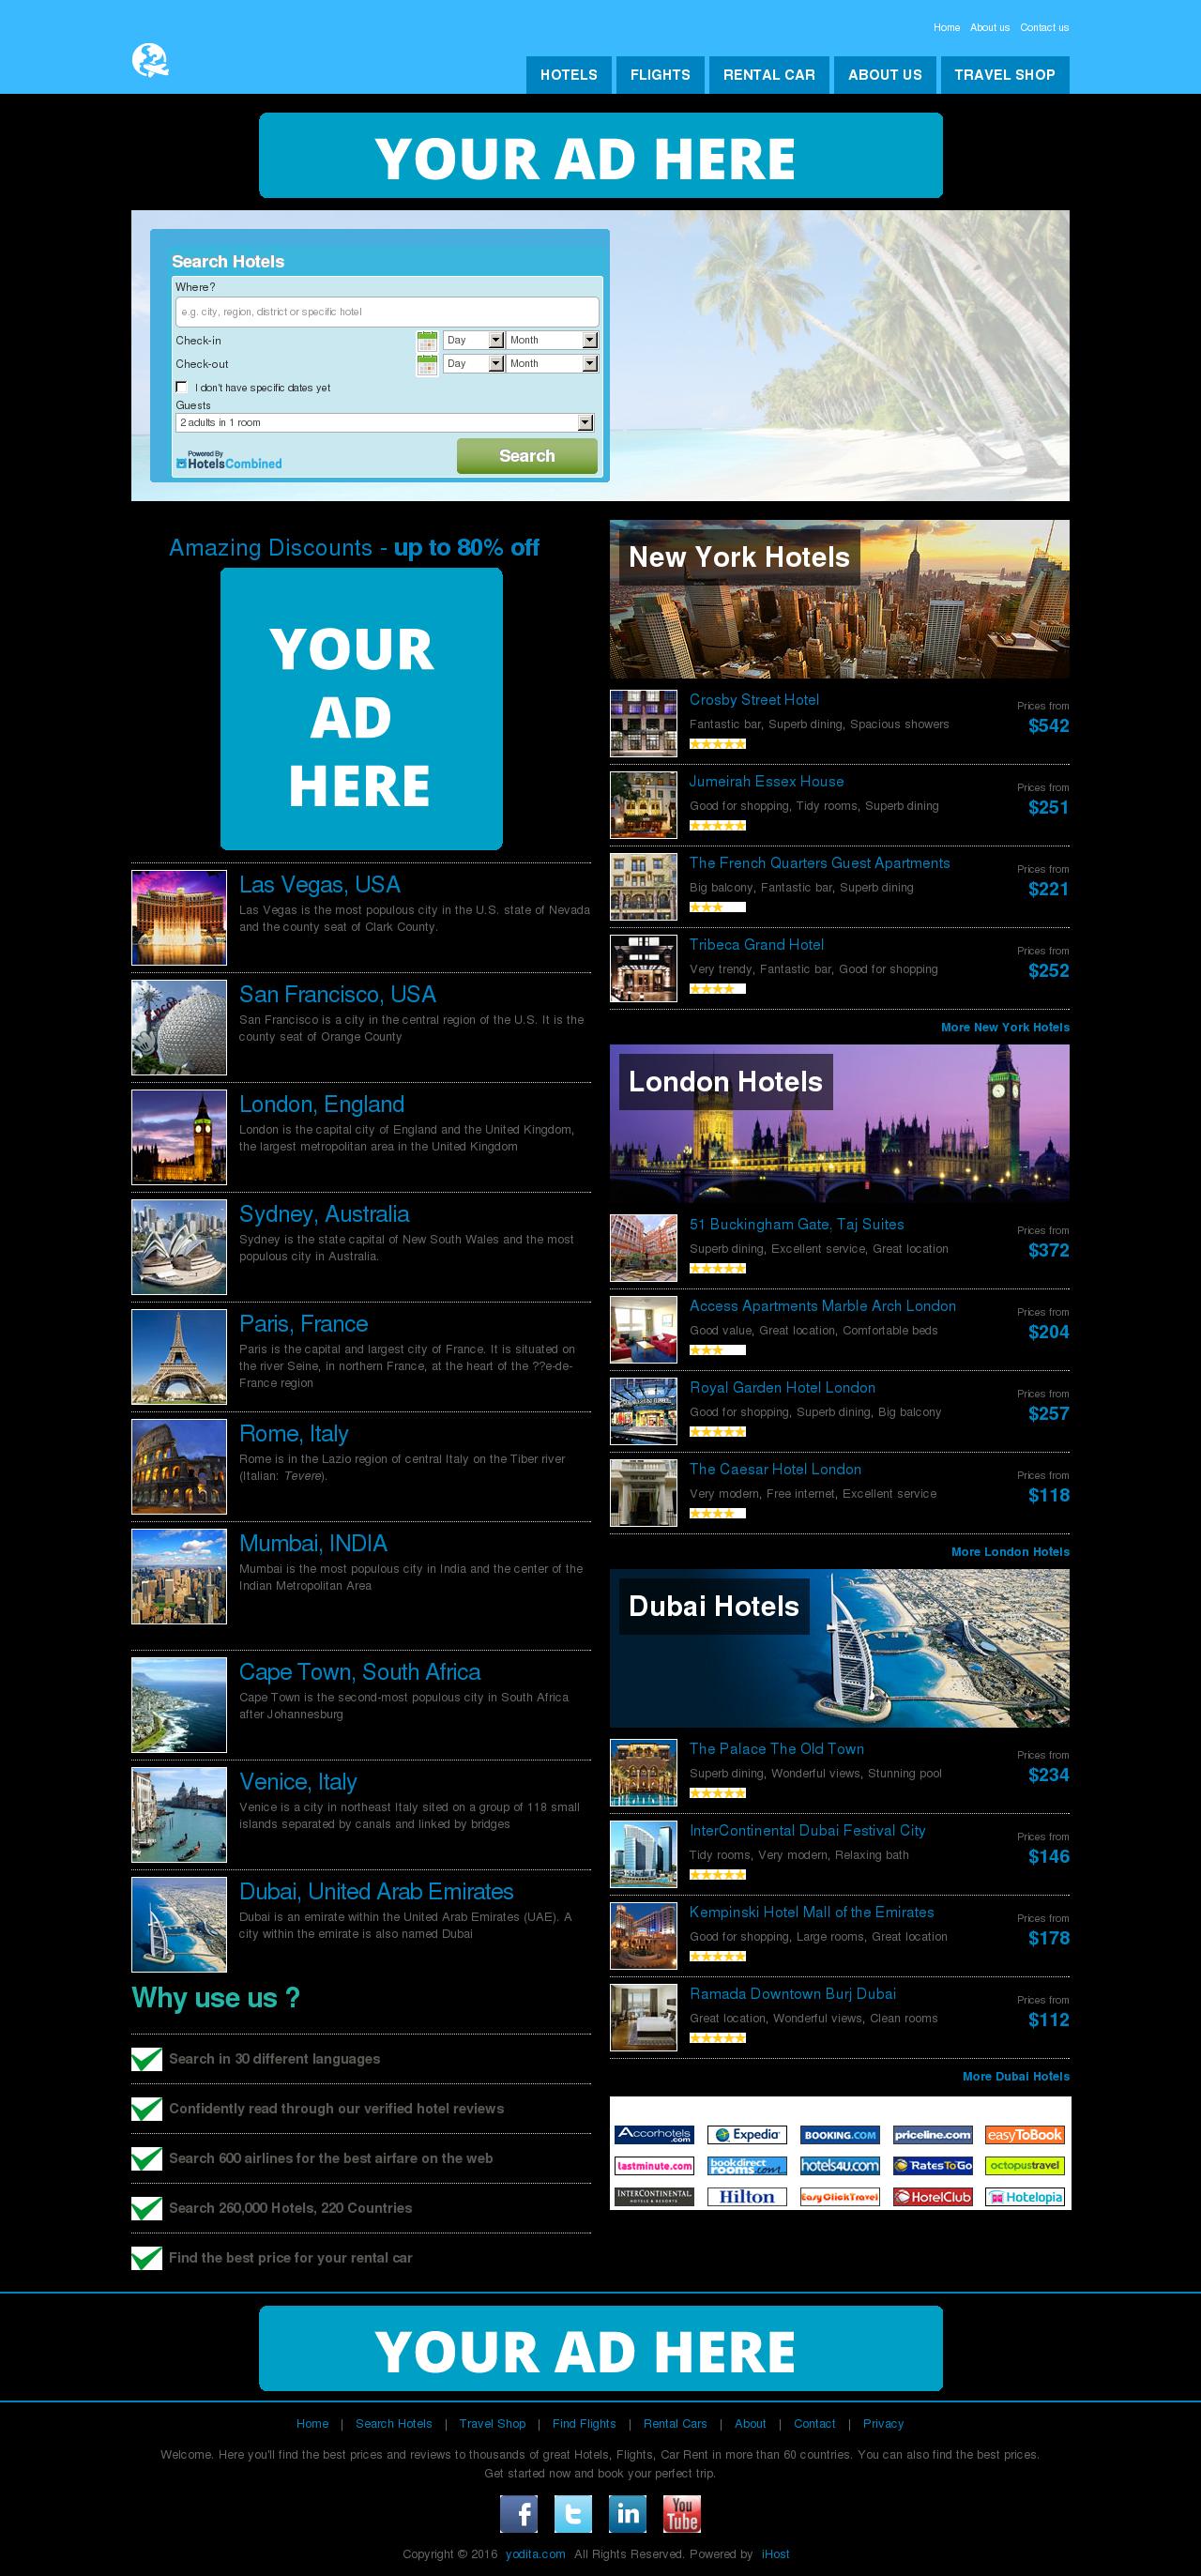 TRAVEL WEBSITE, HOTEL, FLIGHTS, CARS, FREE HOSTIN...